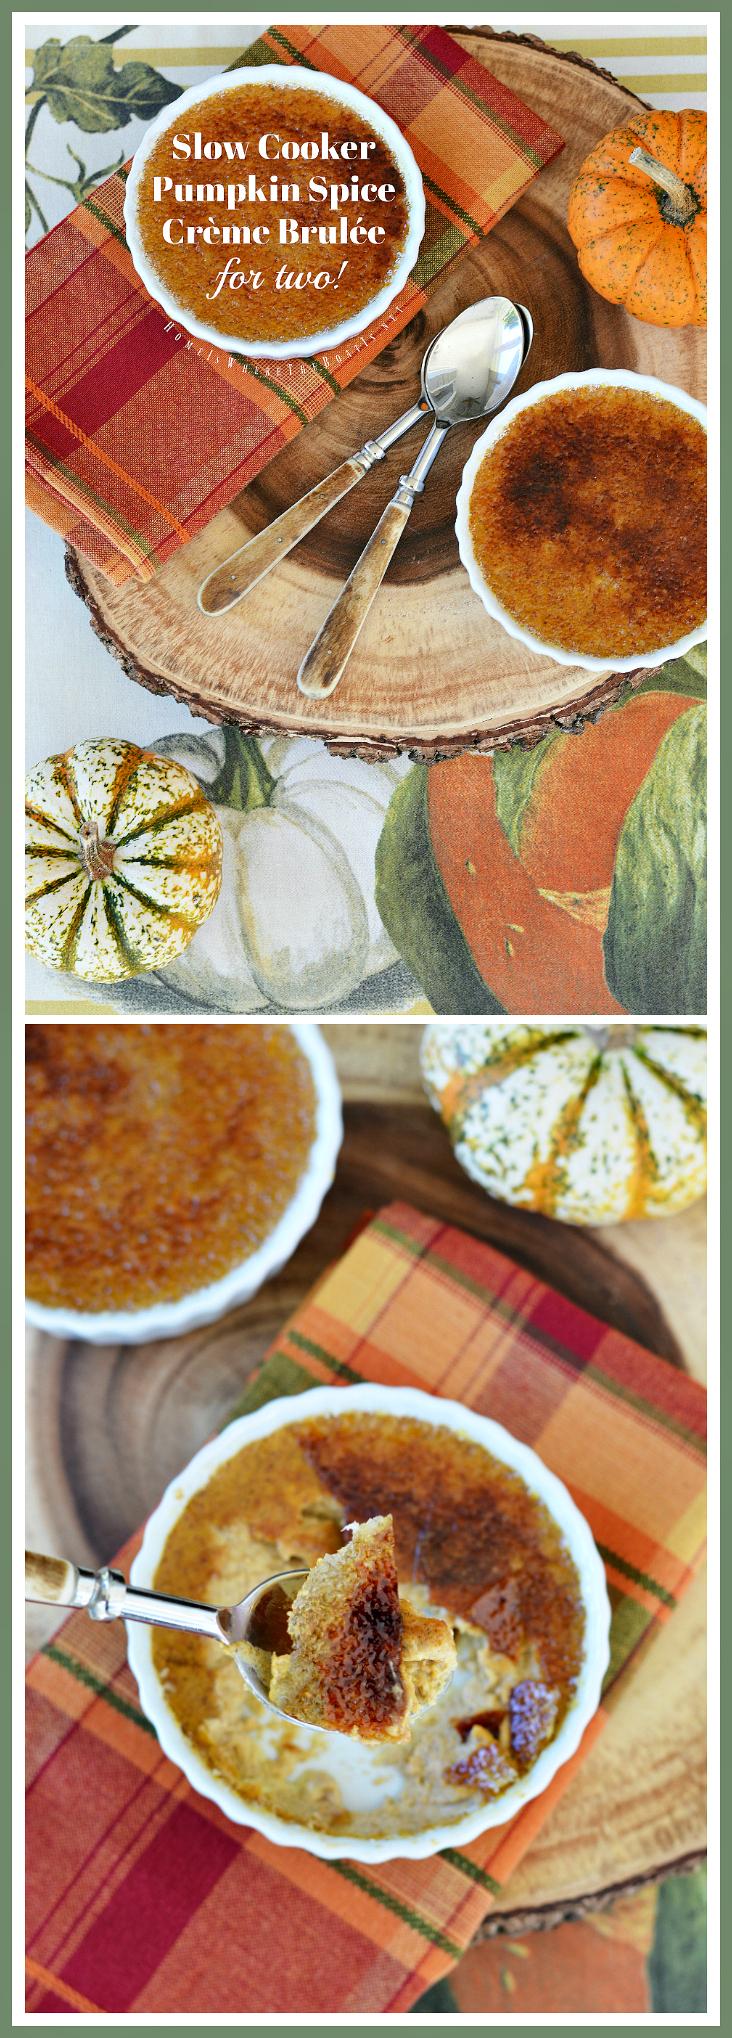 Slow Cooker Pumpkin Spice Crème Brulée for Two! #slowcooker #crockpot #pumpkin #dessert #recipe